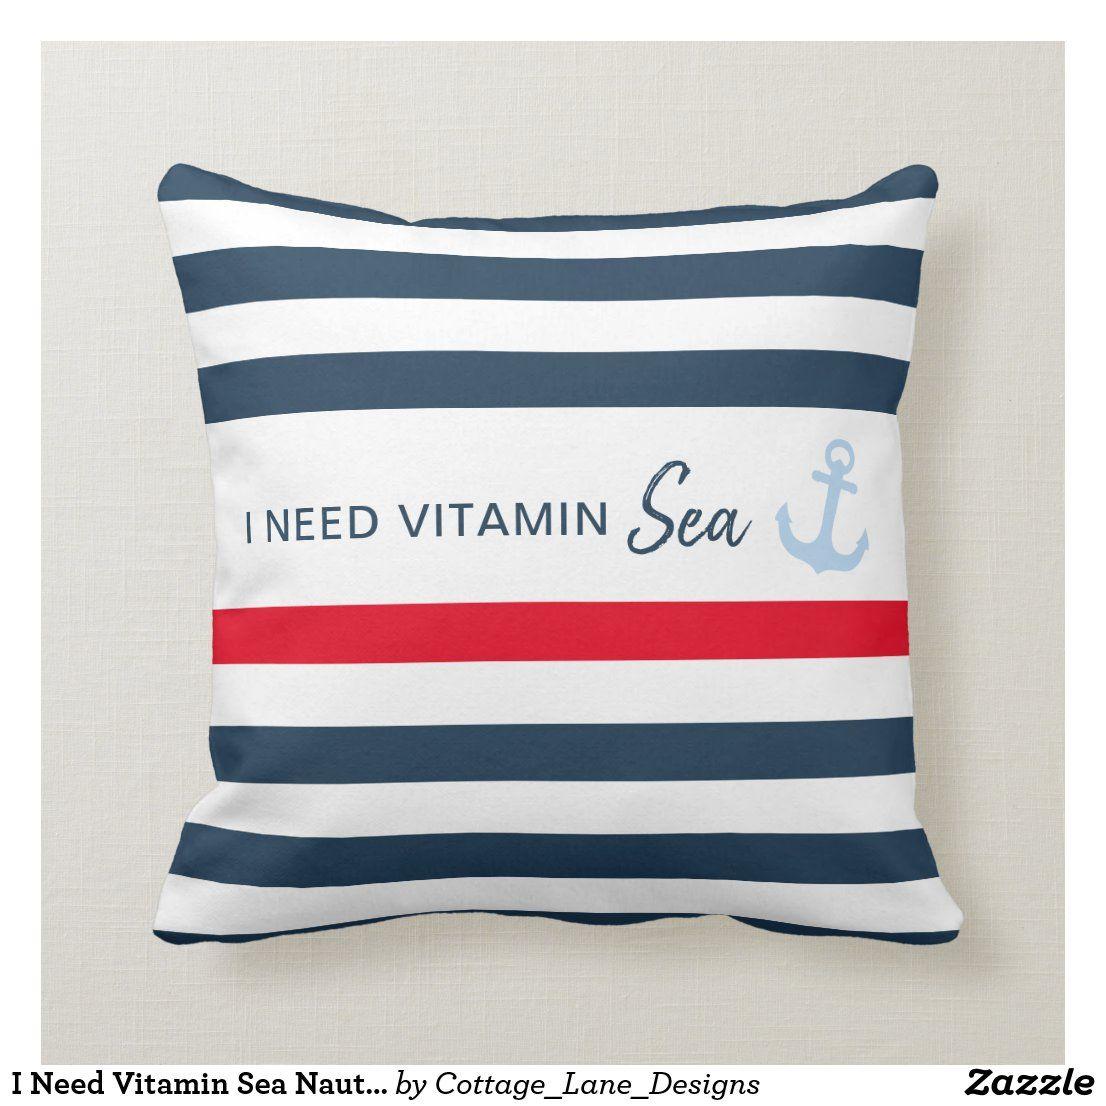 I Need Vitamin Sea Nautical Stripe Anchor Throw Pillow #nauticaldecor #beachhouse #vacationhome